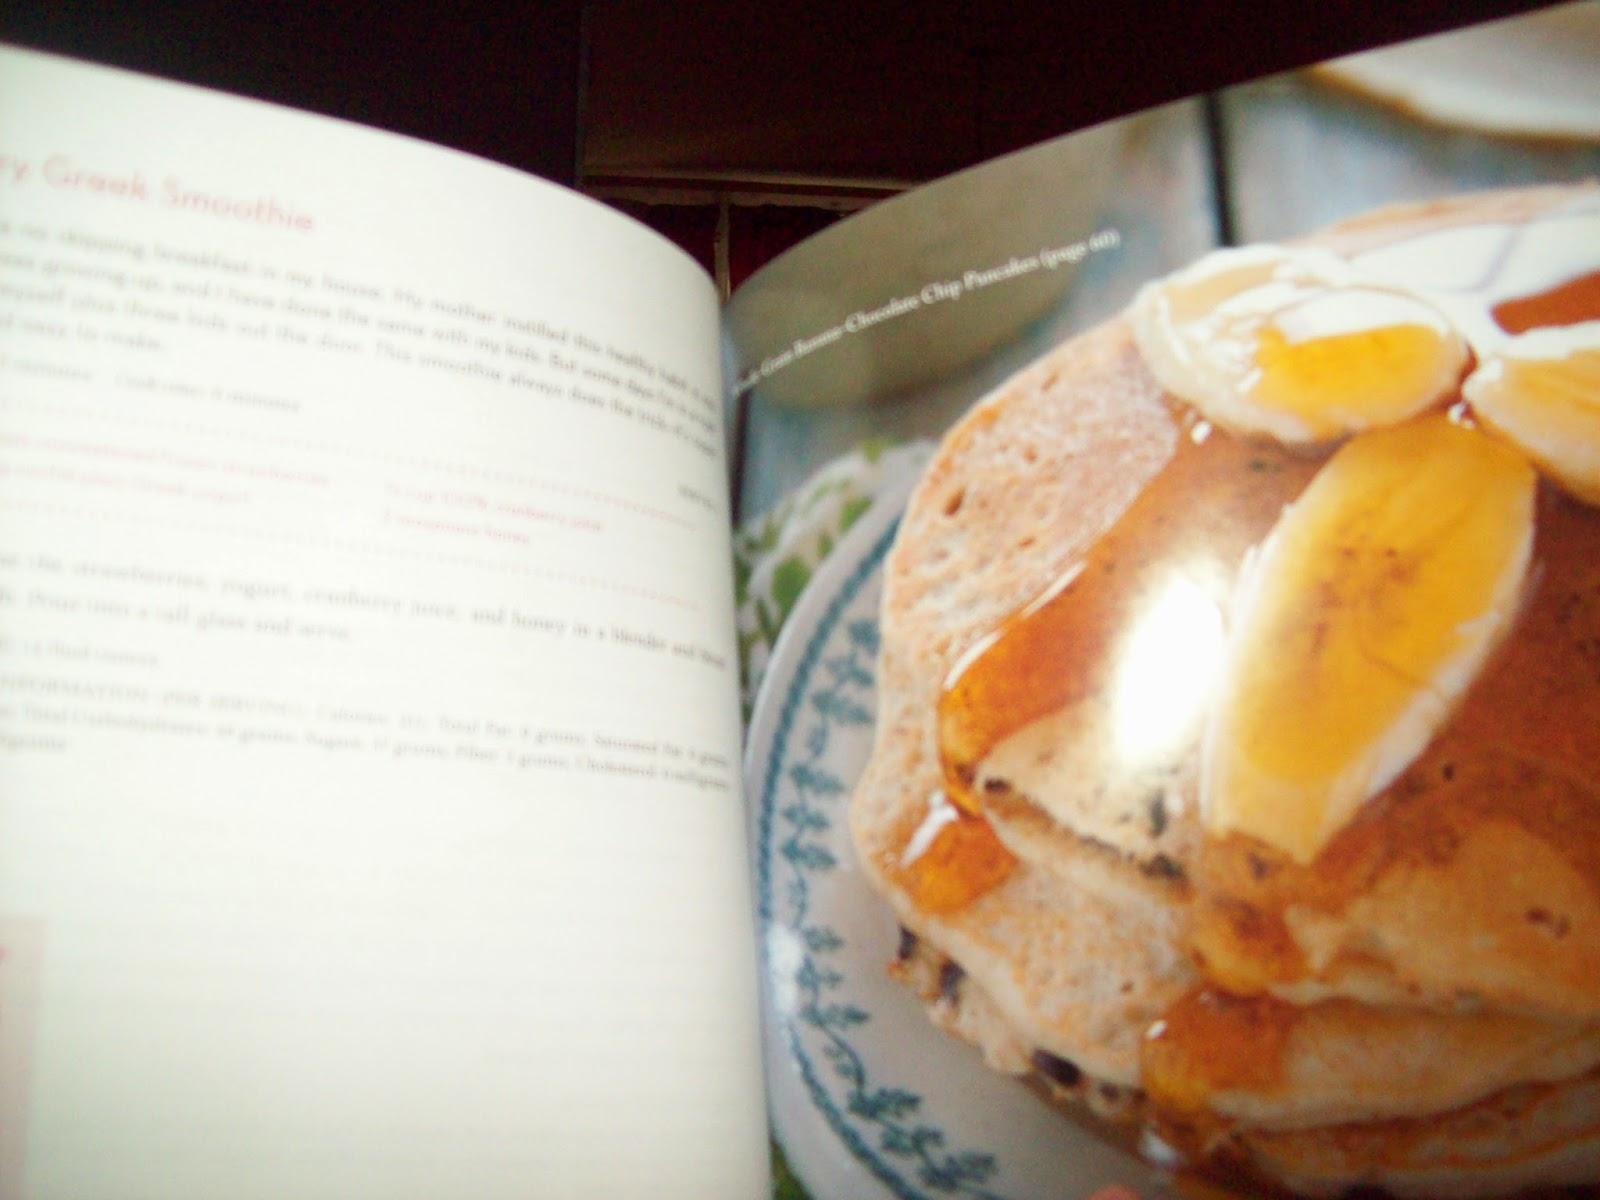 Mimi Loves All 8: The Greek Yogurt Kitchen Cookbook Review/Giveaway